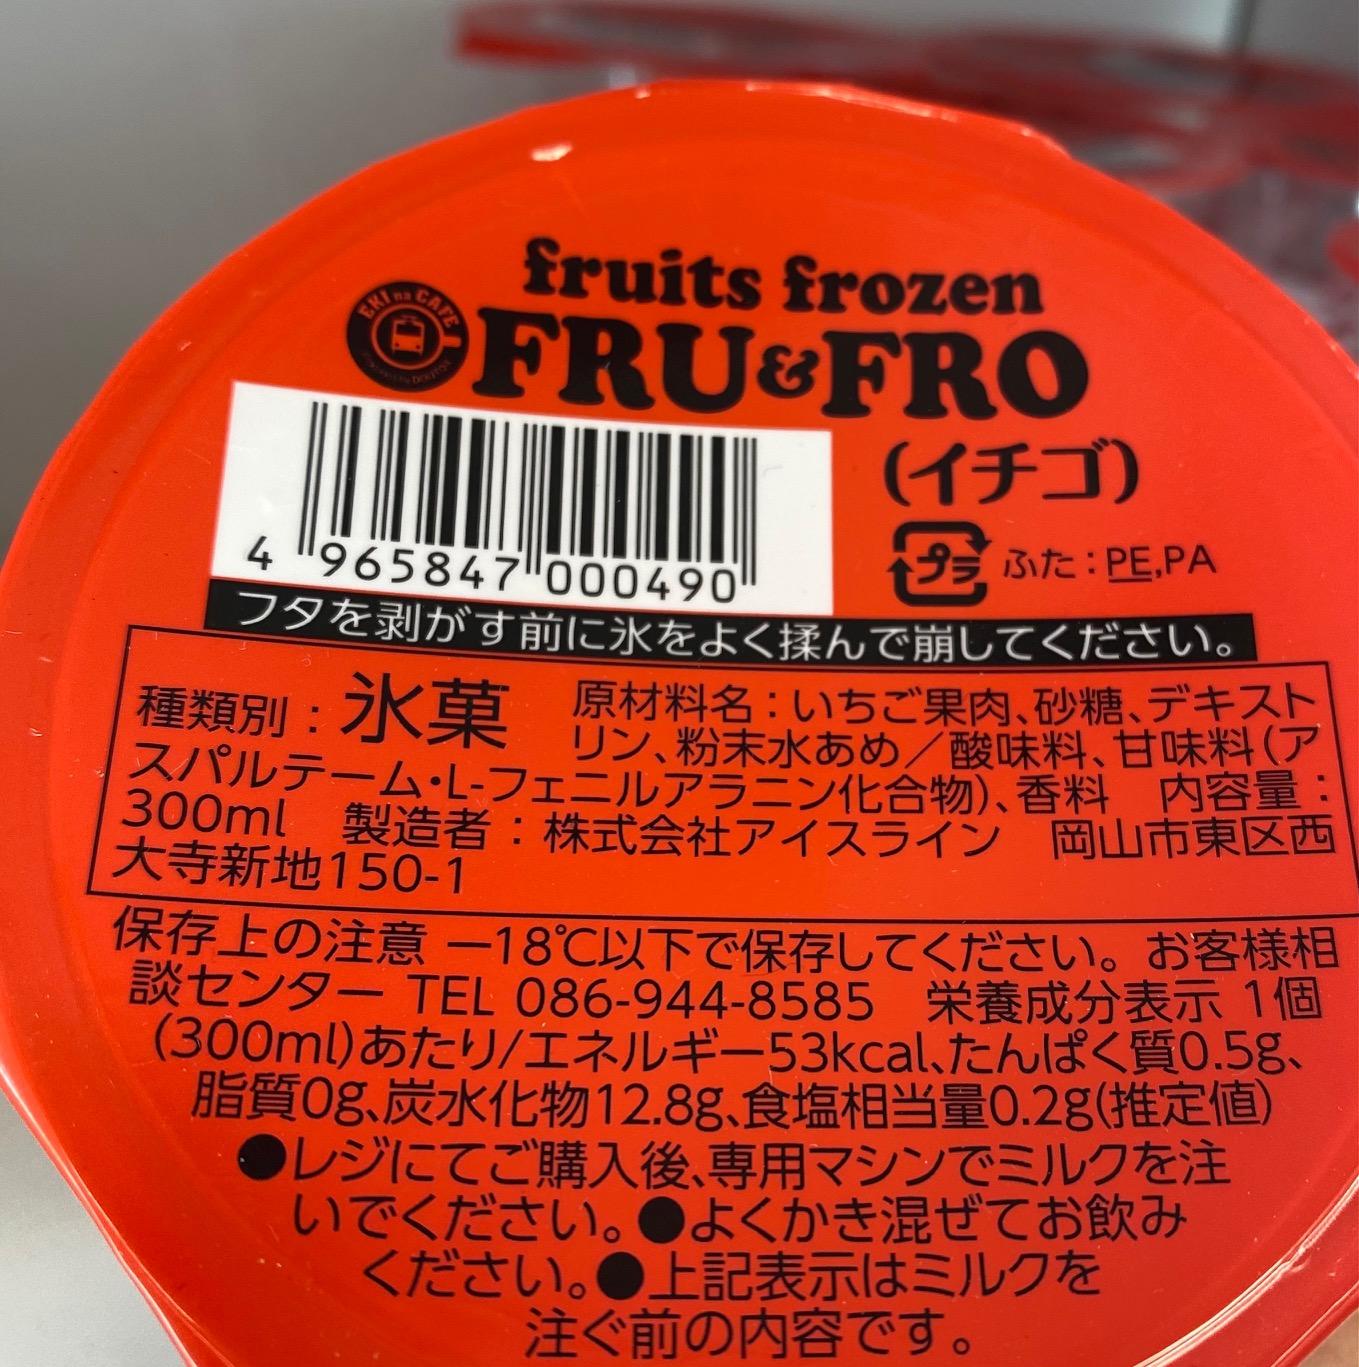 Fruits Frozen Fru & Fro Strawberry ingredient list